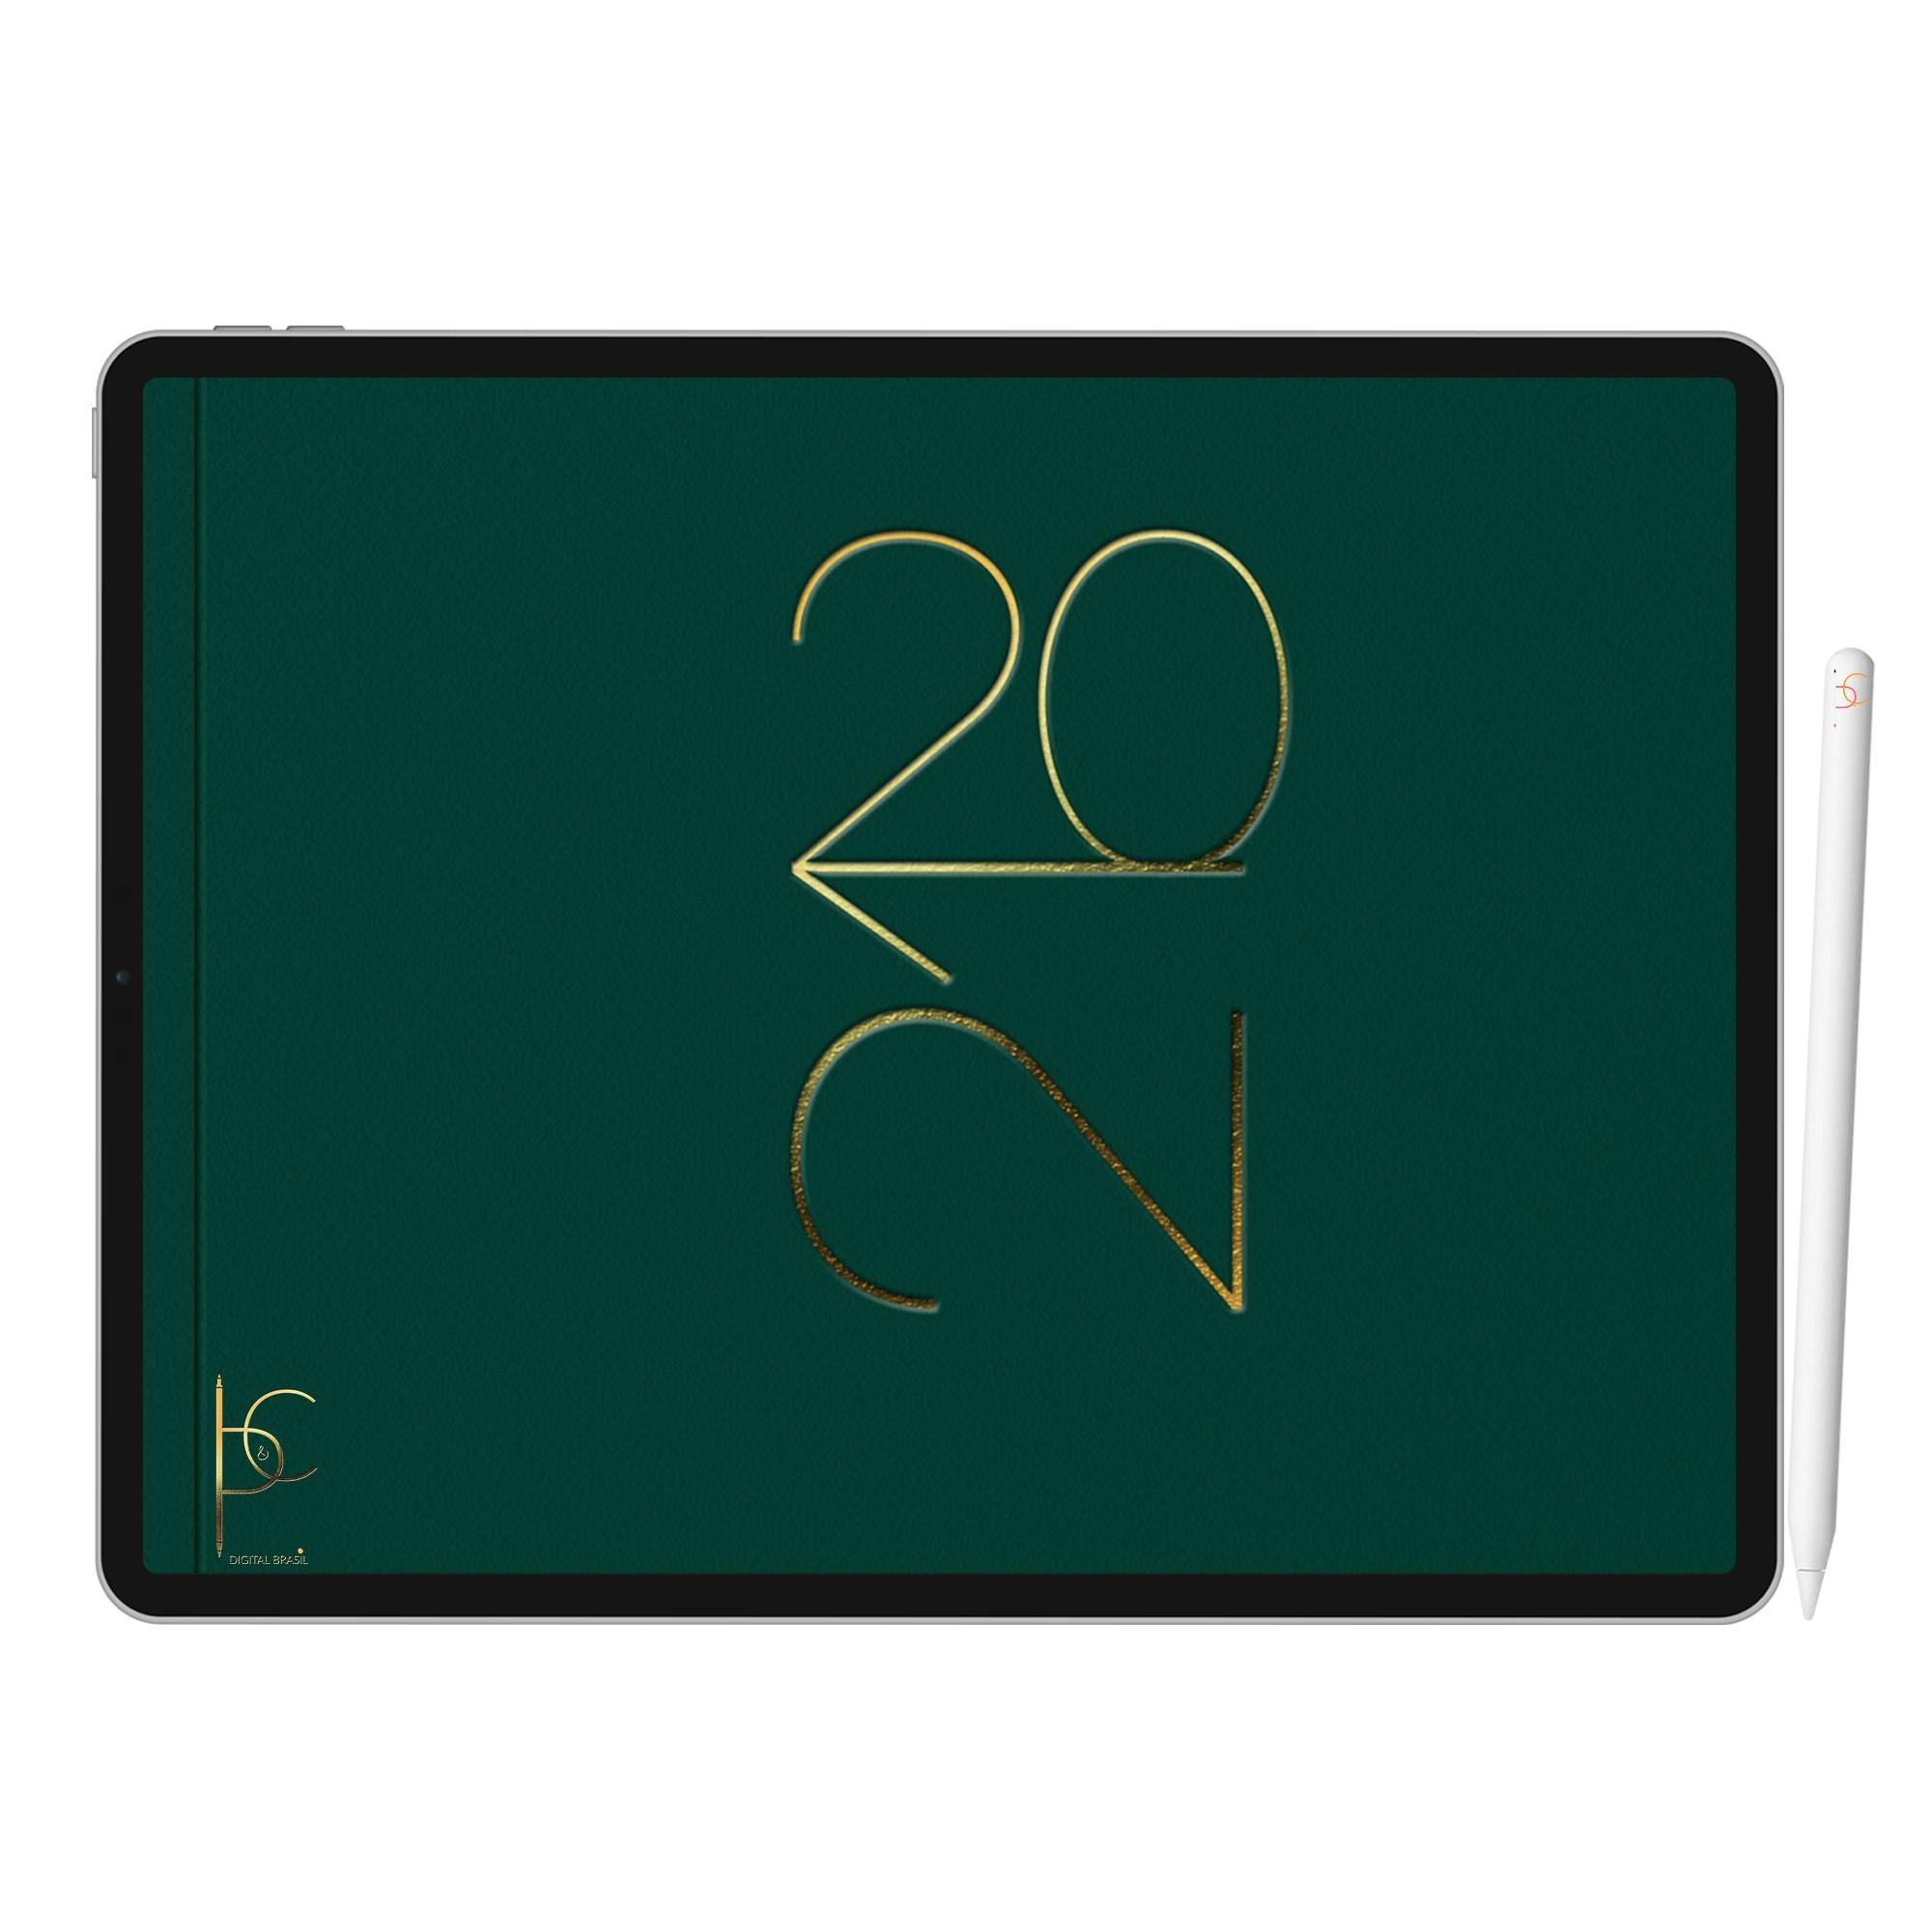 Planner Digital Anual, Mensal, Semanal, Diário | iPad Tablet | Download Instantâneo